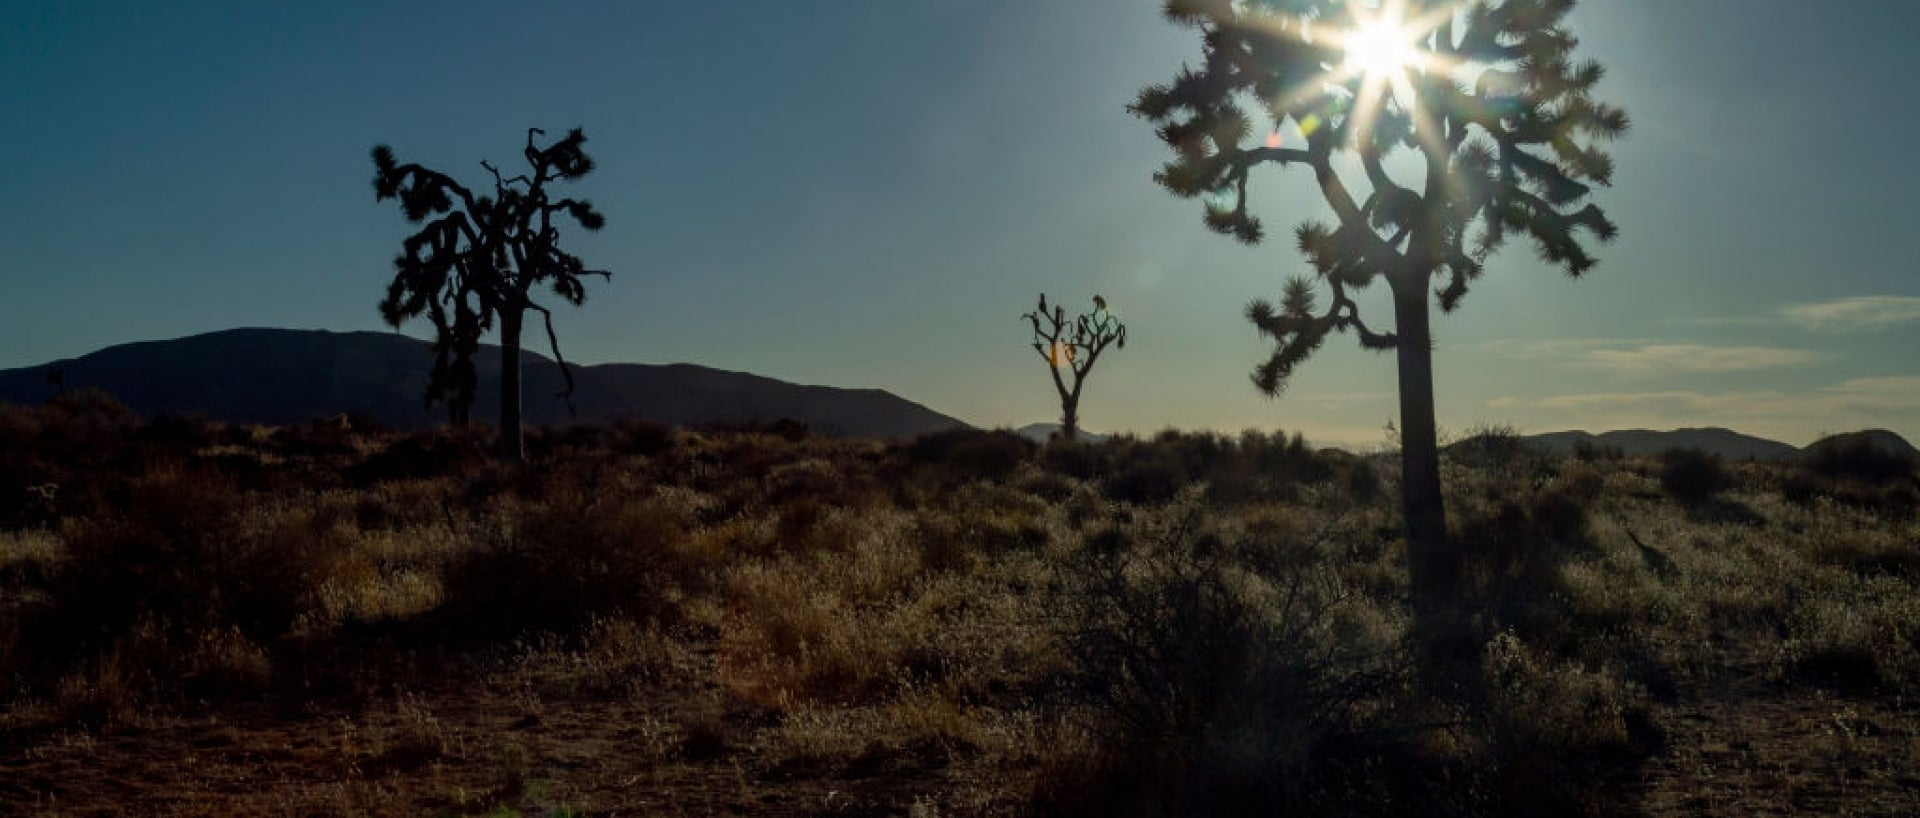 2 Joshua trees in California